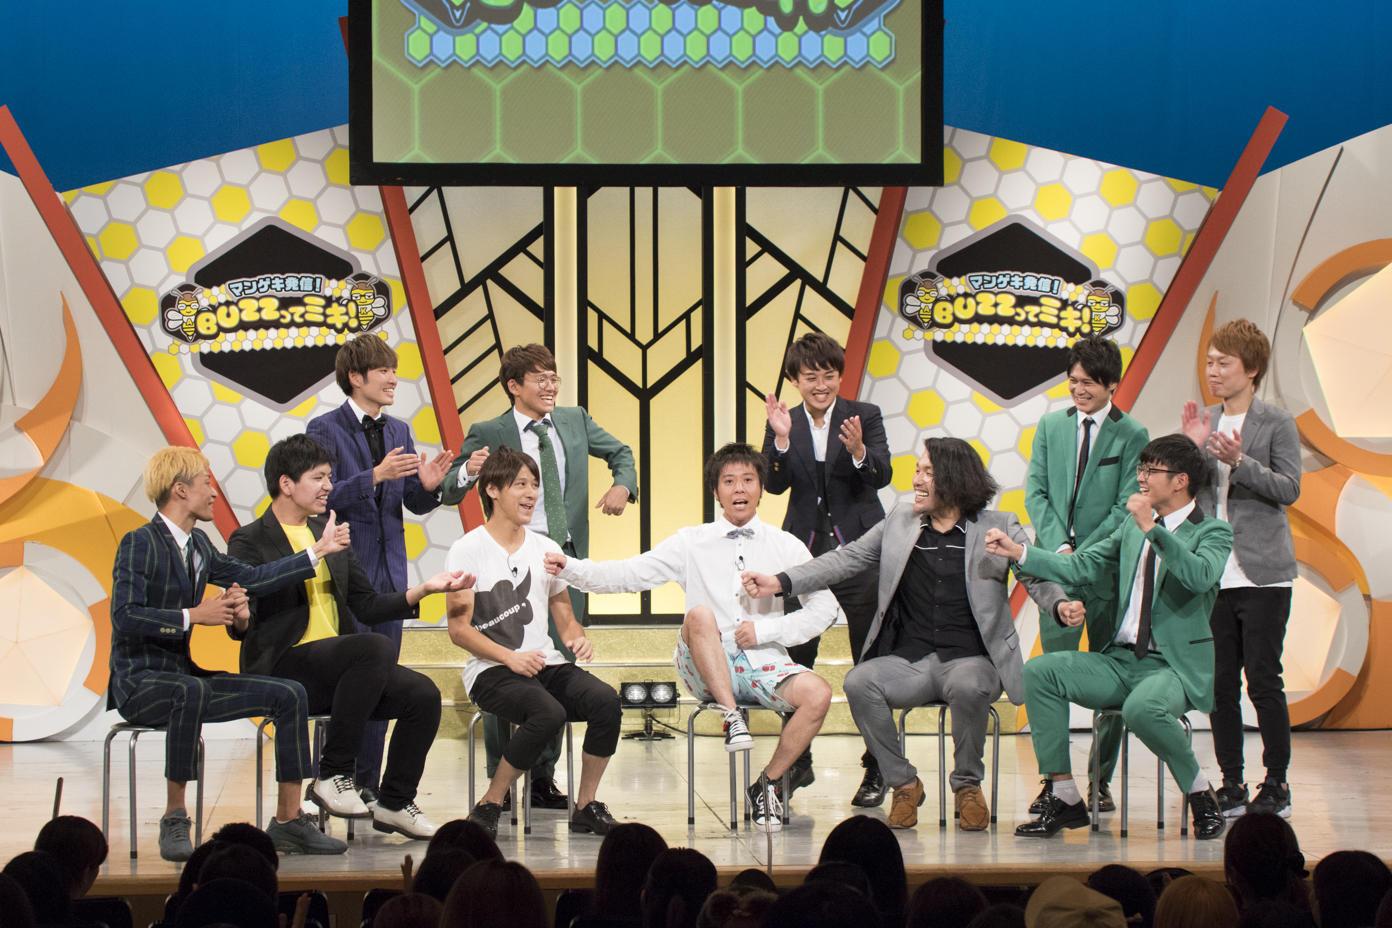 http://news.yoshimoto.co.jp/20170908070441-2a32db86c33ce5224fe61b850beaebeb37569e9c.jpg